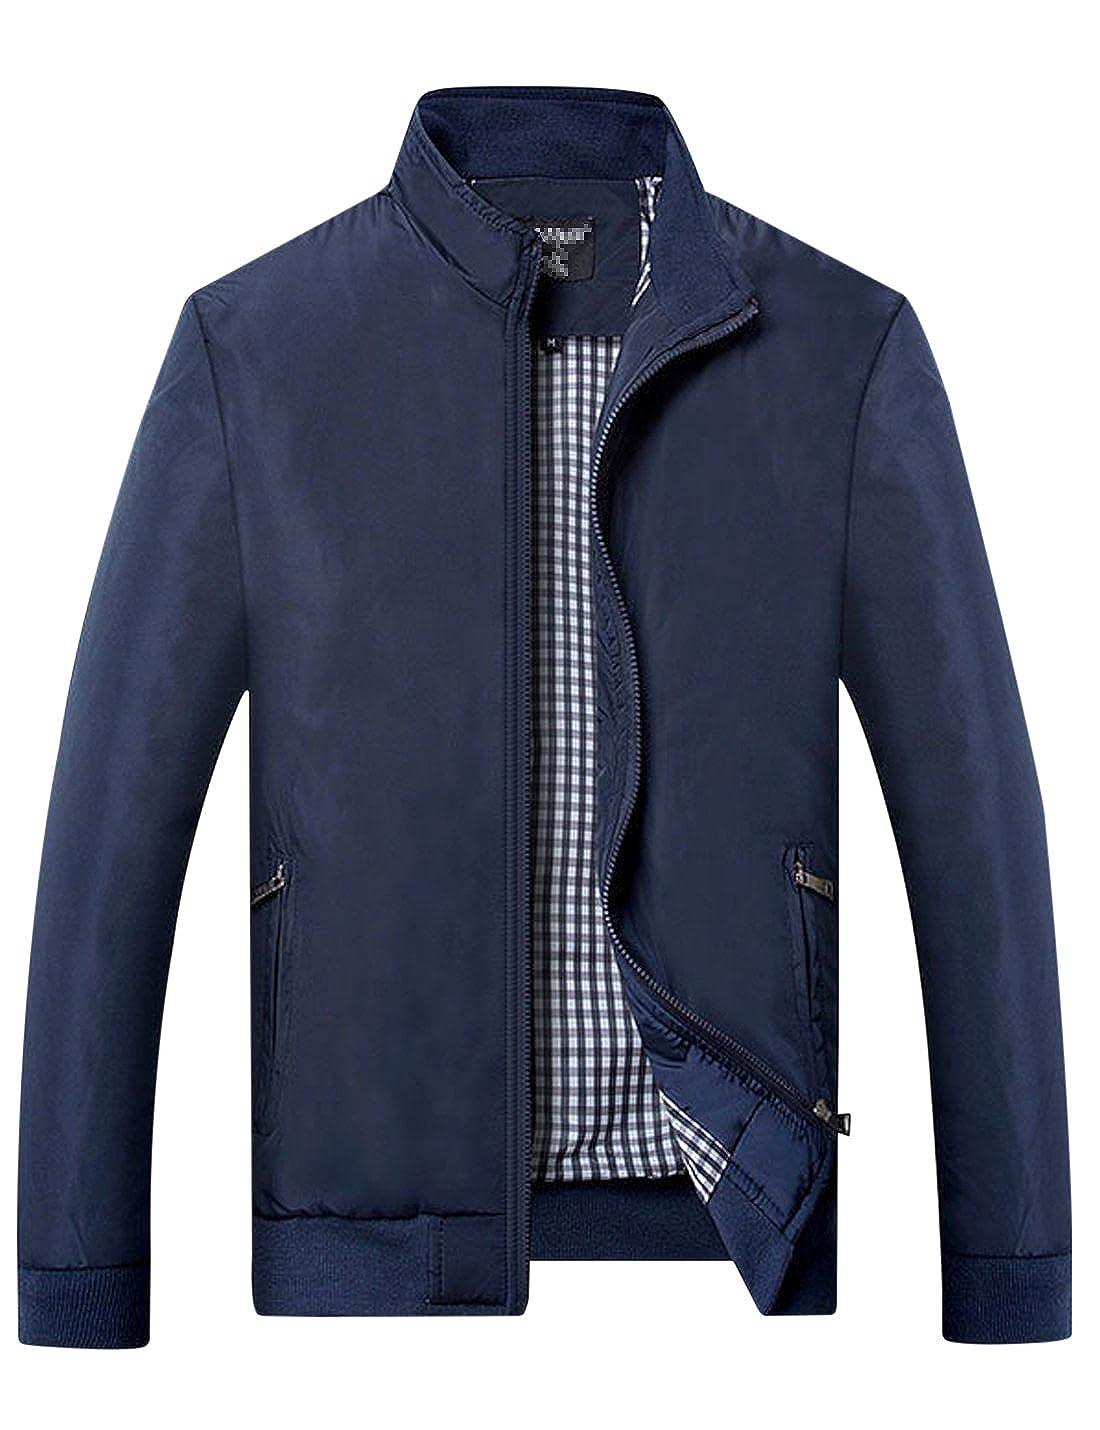 Yeokou Men's Casual Slim Stand Collar Lightweight Thin Windbreaker Fall Jacket